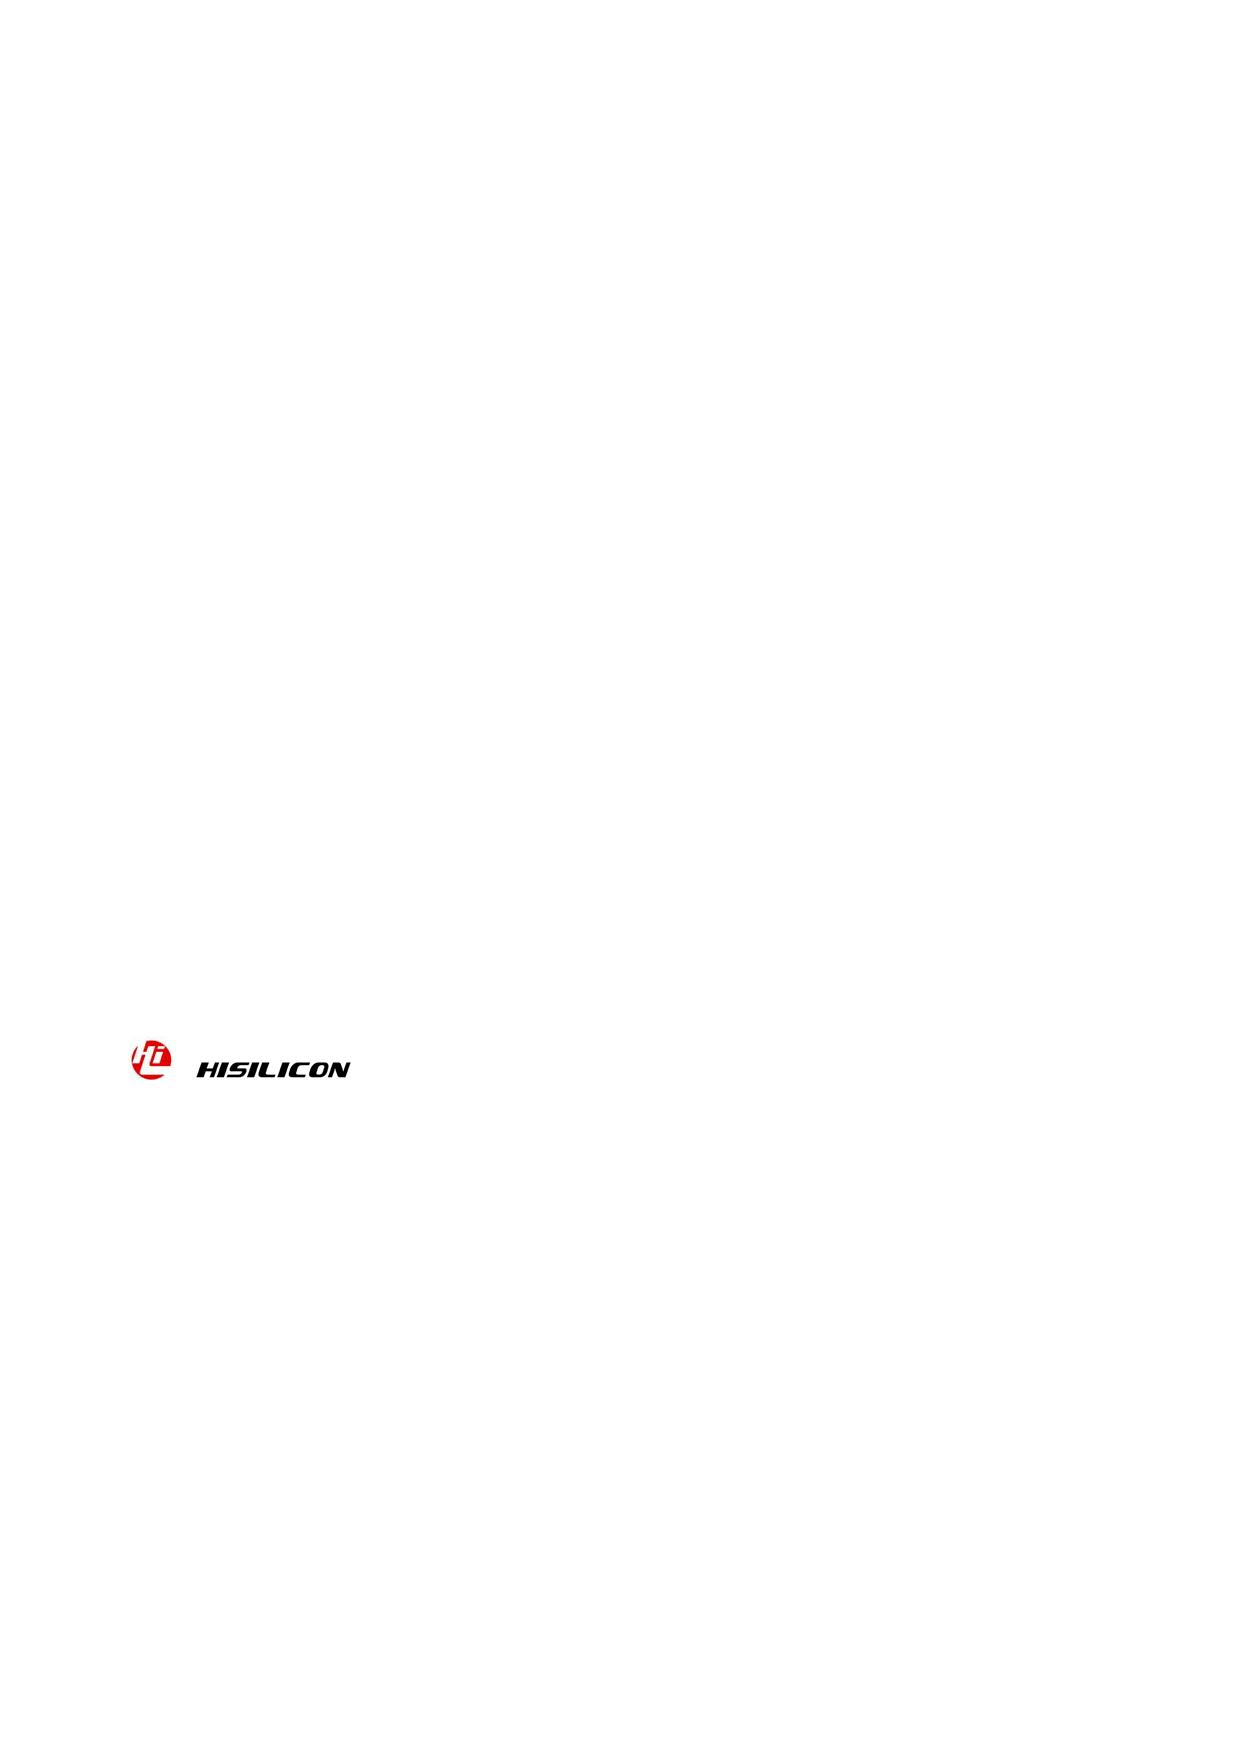 Hi3520 pdf, schematic